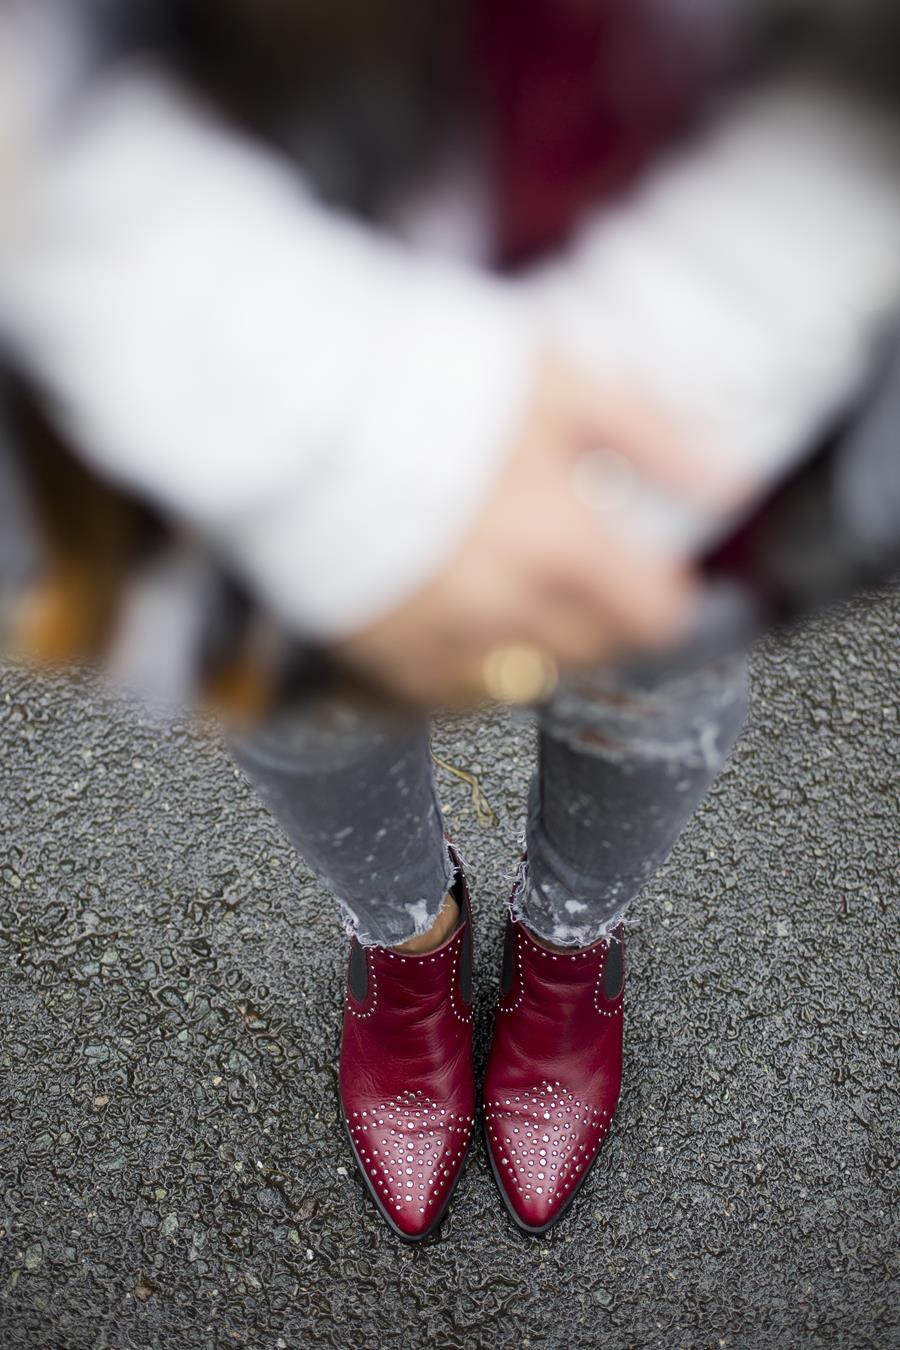 Rebeca Valdivia, asesora de imagen, personal shopper, estilista, stilist, influencer, Donostia, San Sebastián, Miss Clov, la blogger indie, influencer, ripped jeans, vaqueros rotos, denim, botín campero, tachas, alma y pena, boho & chic, abrigo pelo, fax fur coat, tomboystyle, jersey punto, sweater